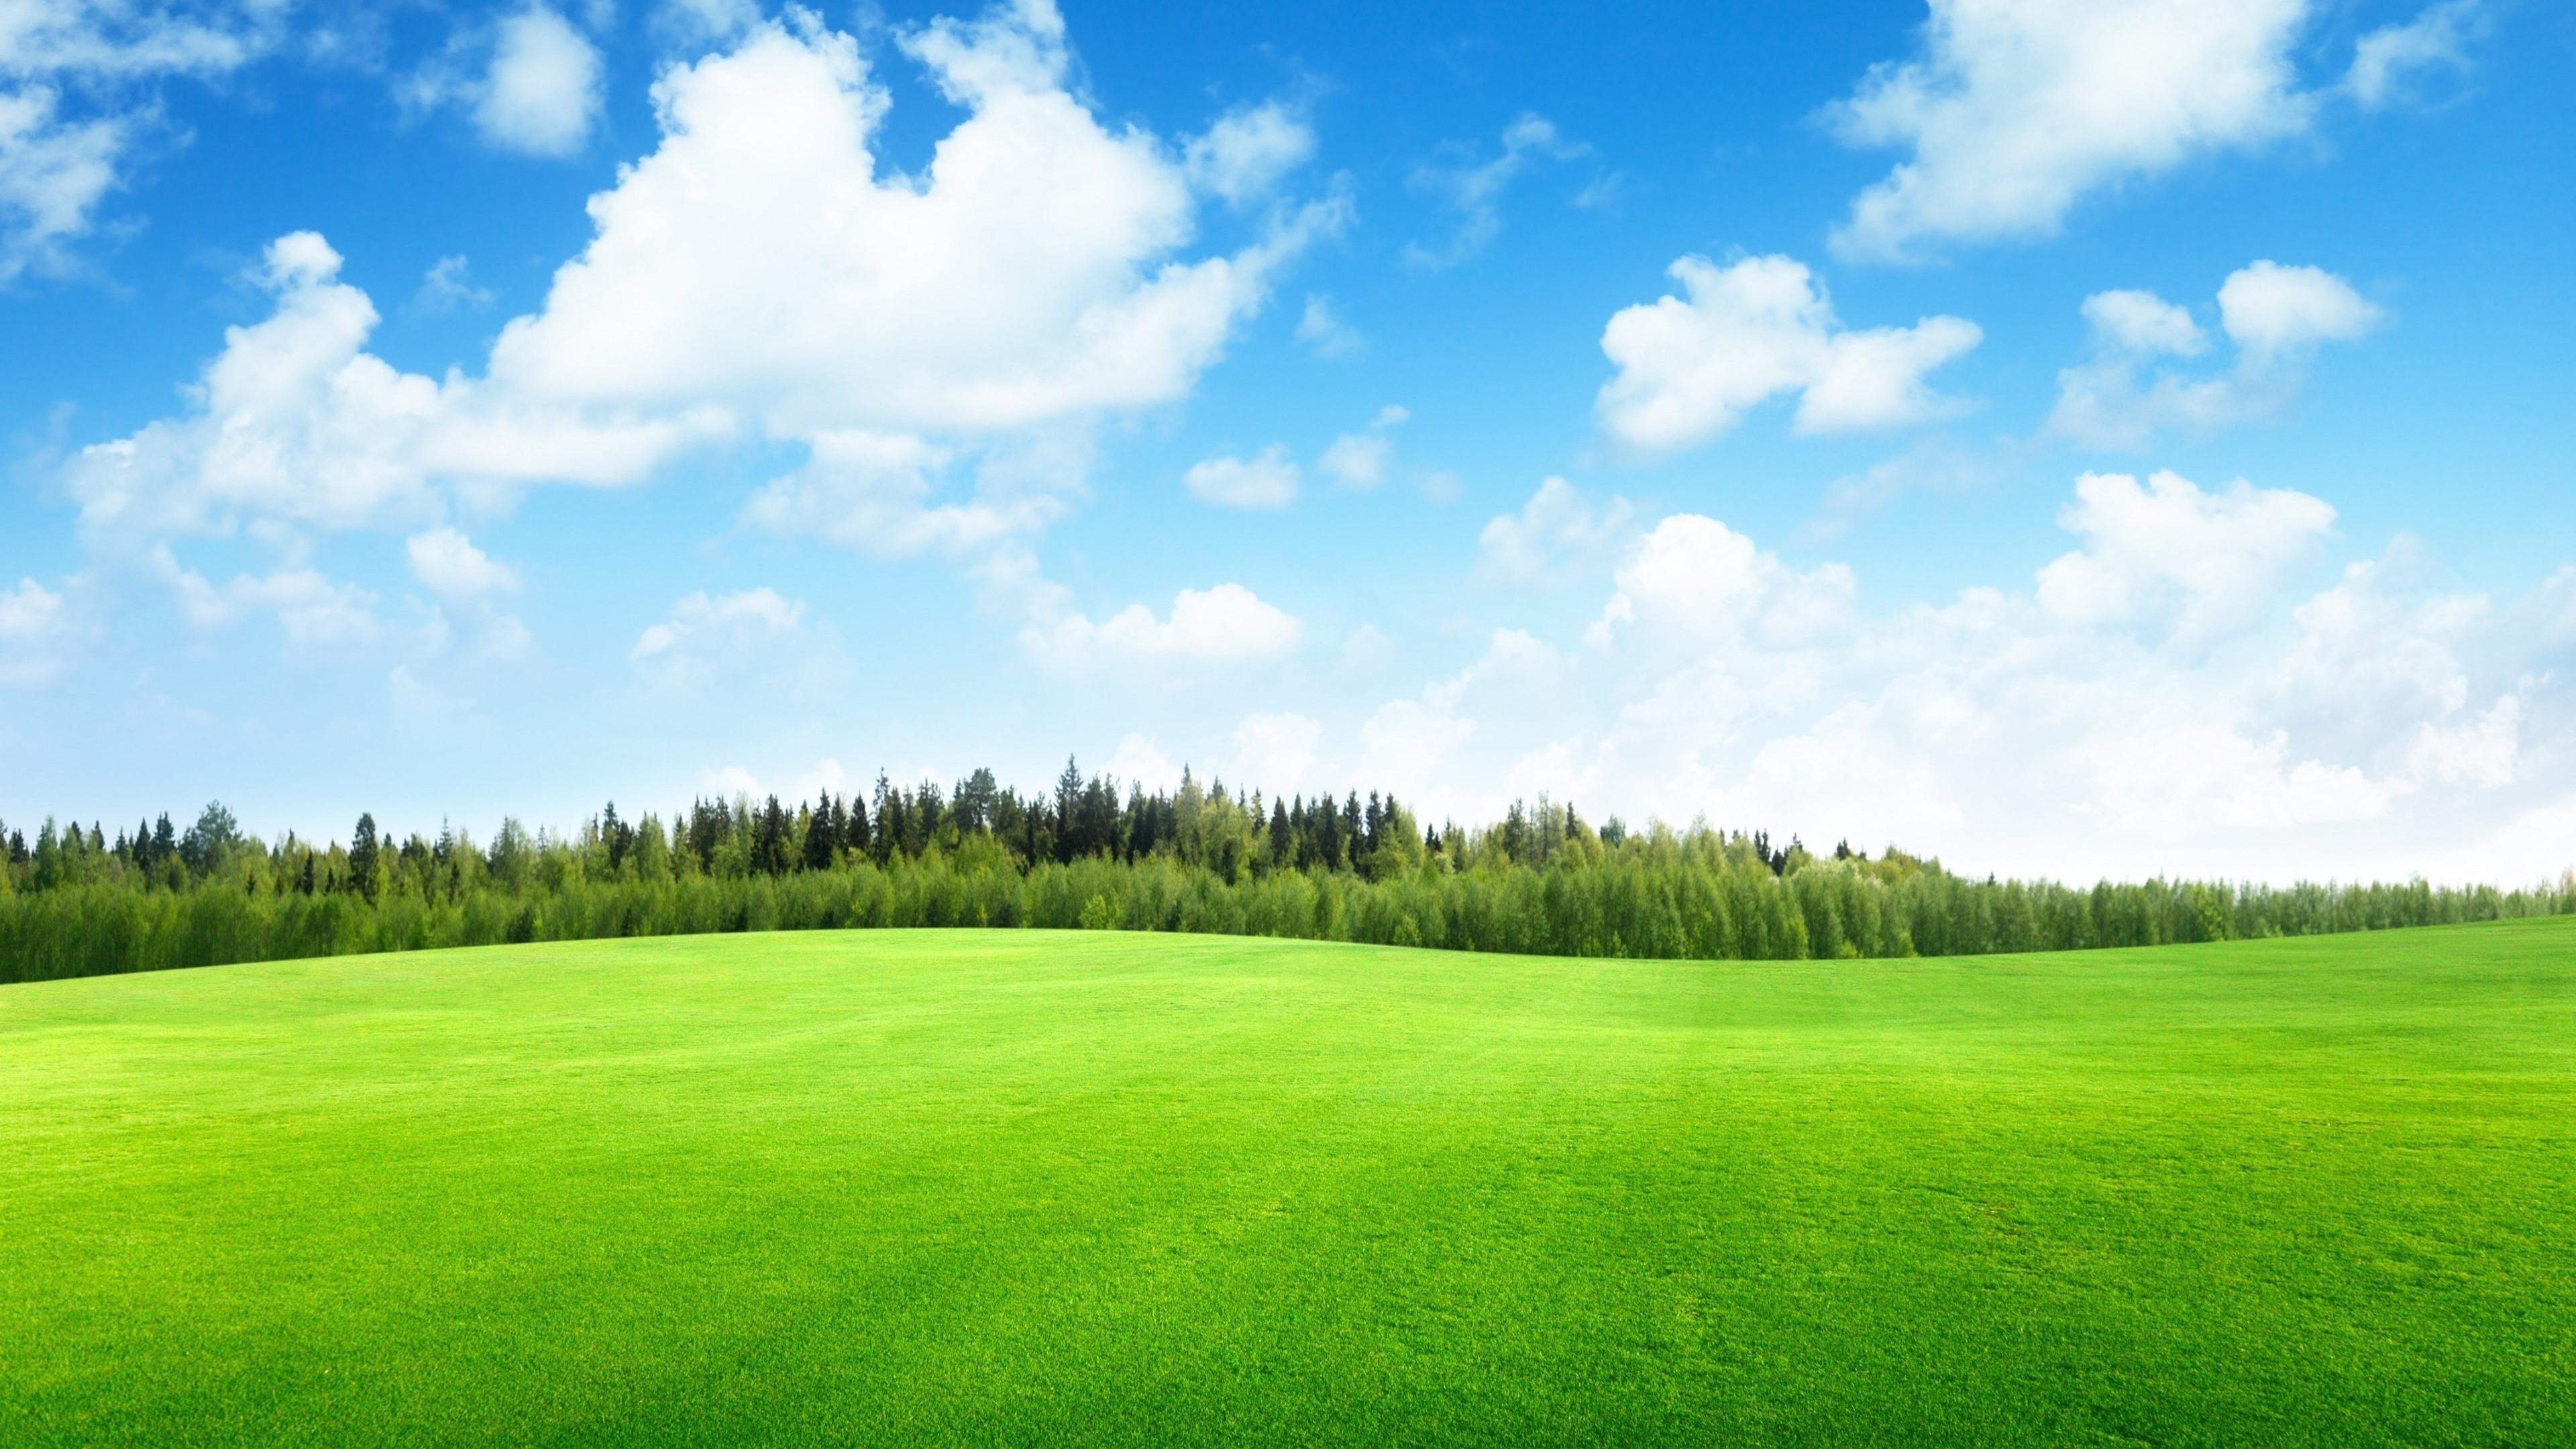 The Lawn hd desktop wallpaper